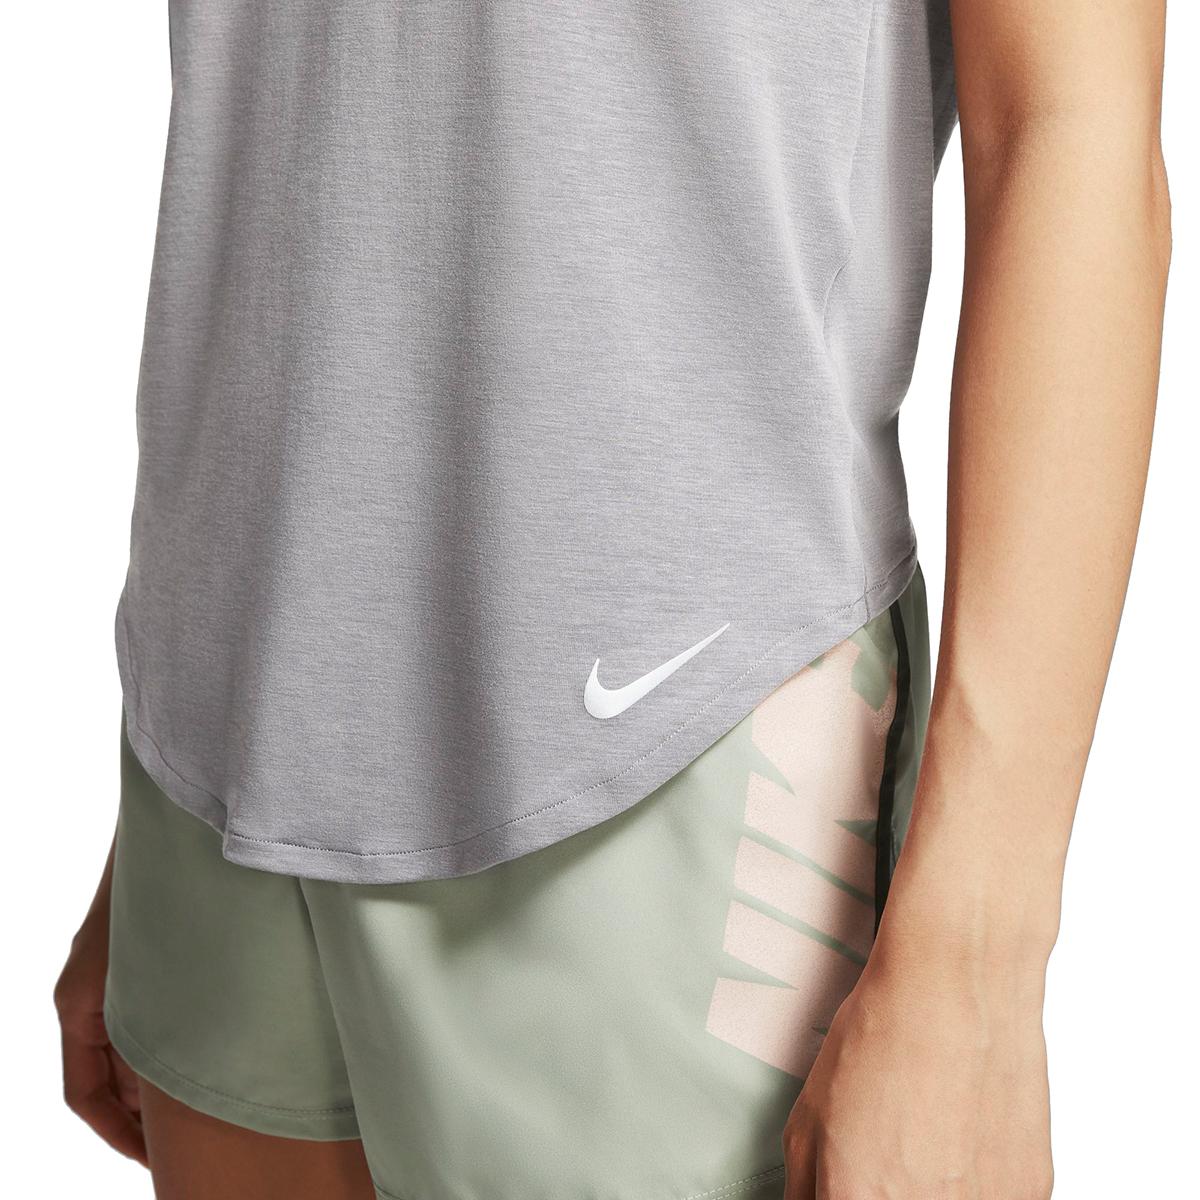 Women's Nike Twist Top Short Sleeve   - Color: Gunsmoke/Heather - Size: XL, Gunsmoke/Heather, large, image 4